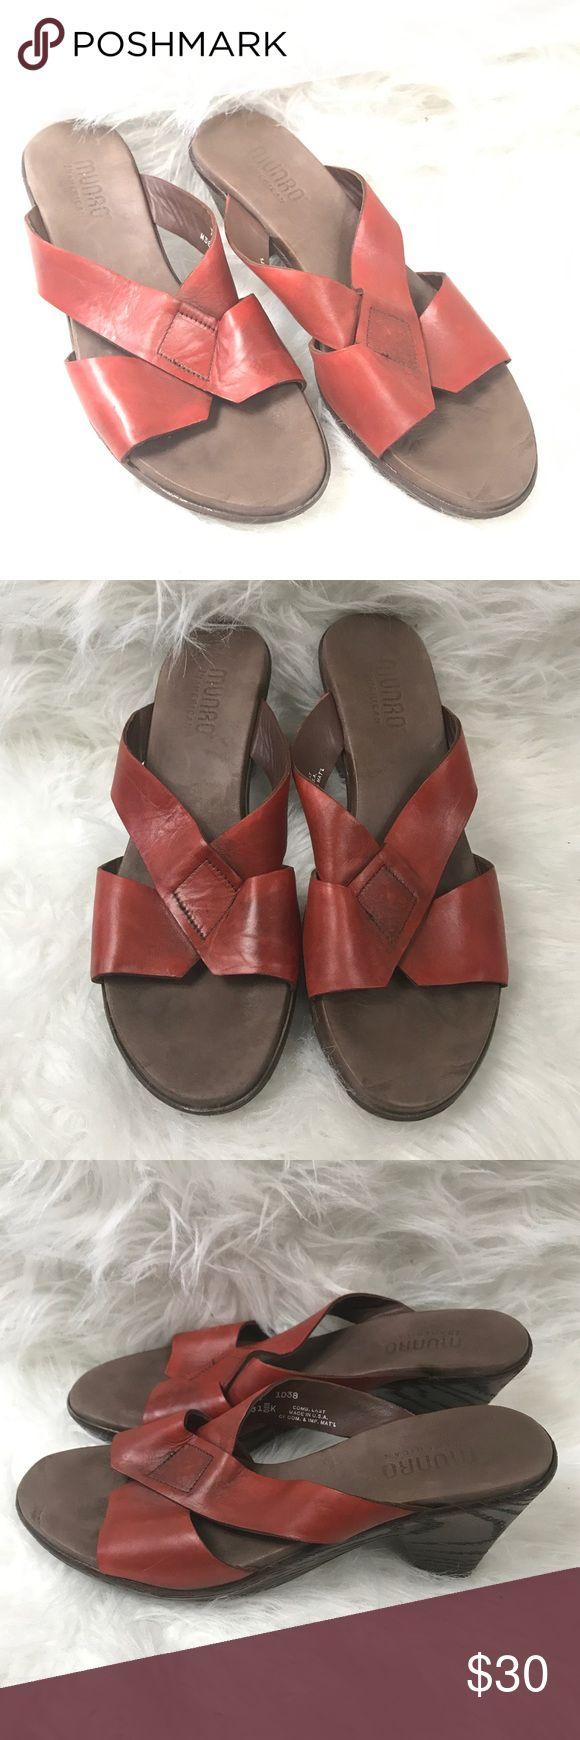 MUNRO ORANGE CRISS CROSS SLIP ON SHOES SIZE 7.5 Good condition Munro slip on shoes size 7.5 Munro Shoes Sandals